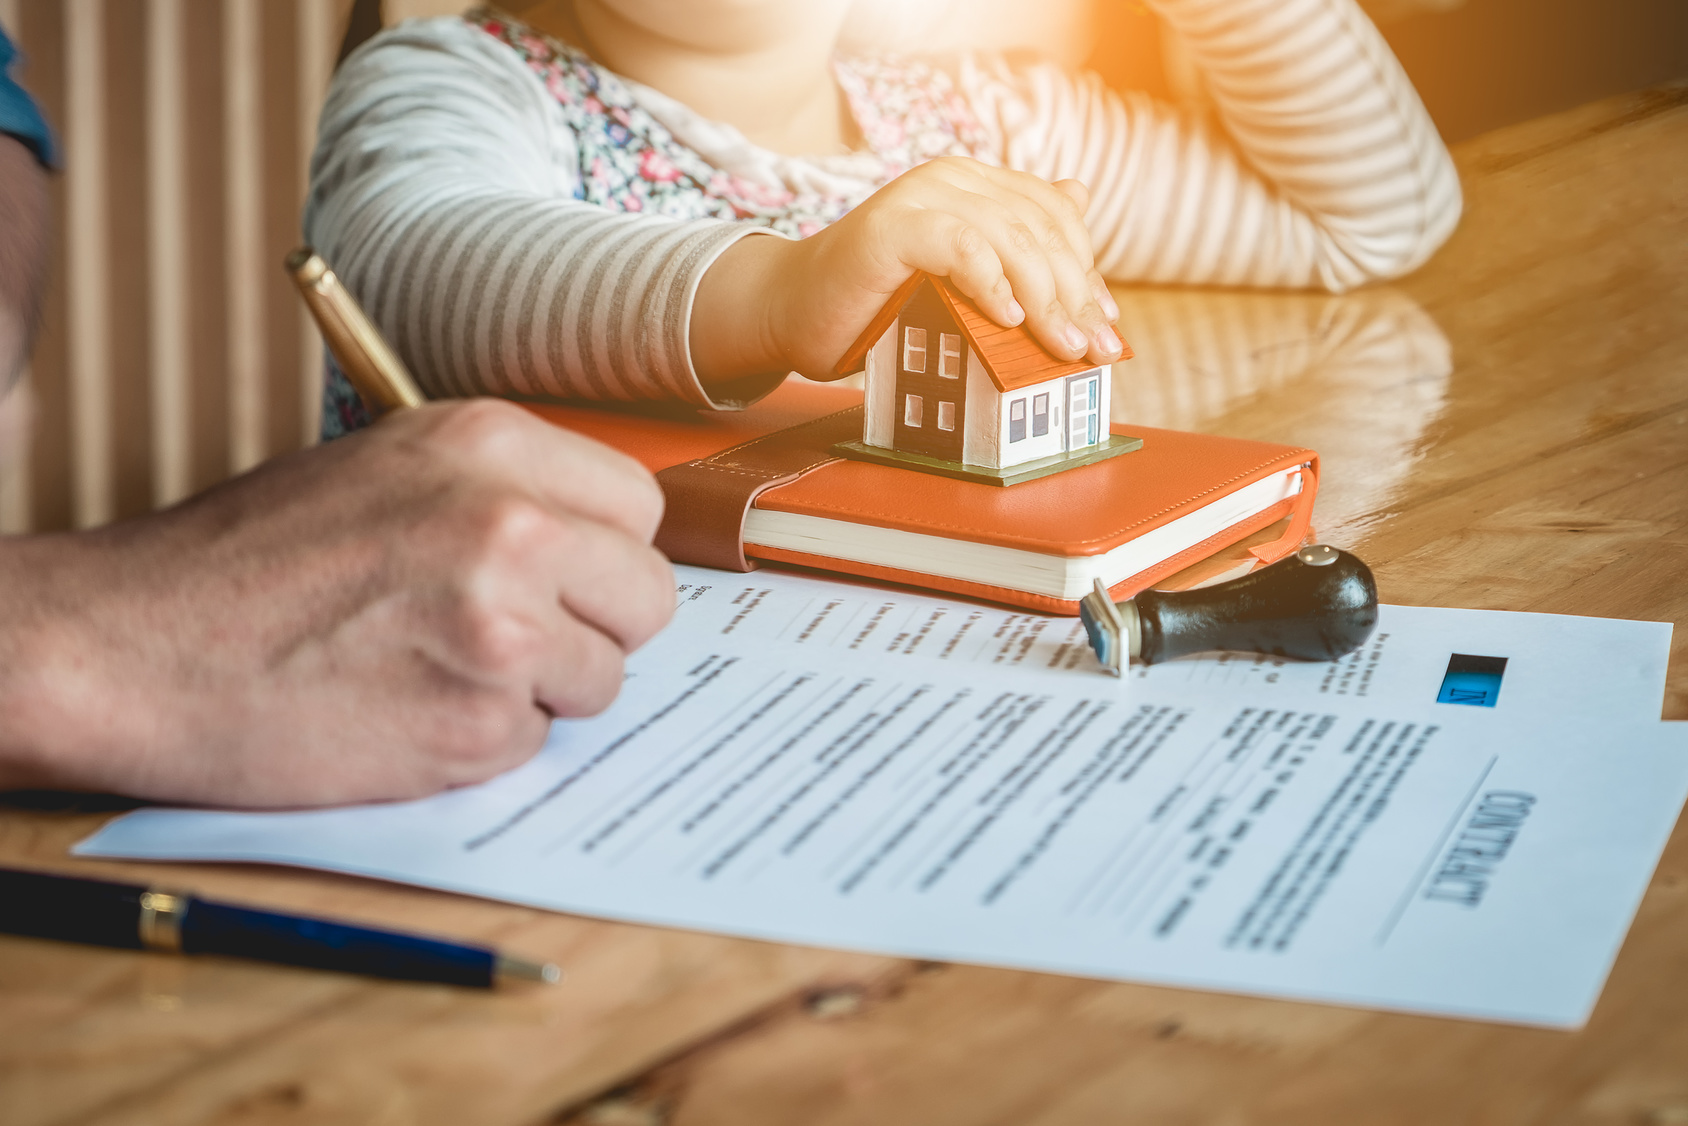 Signature d'un mandat exclusif immobilier